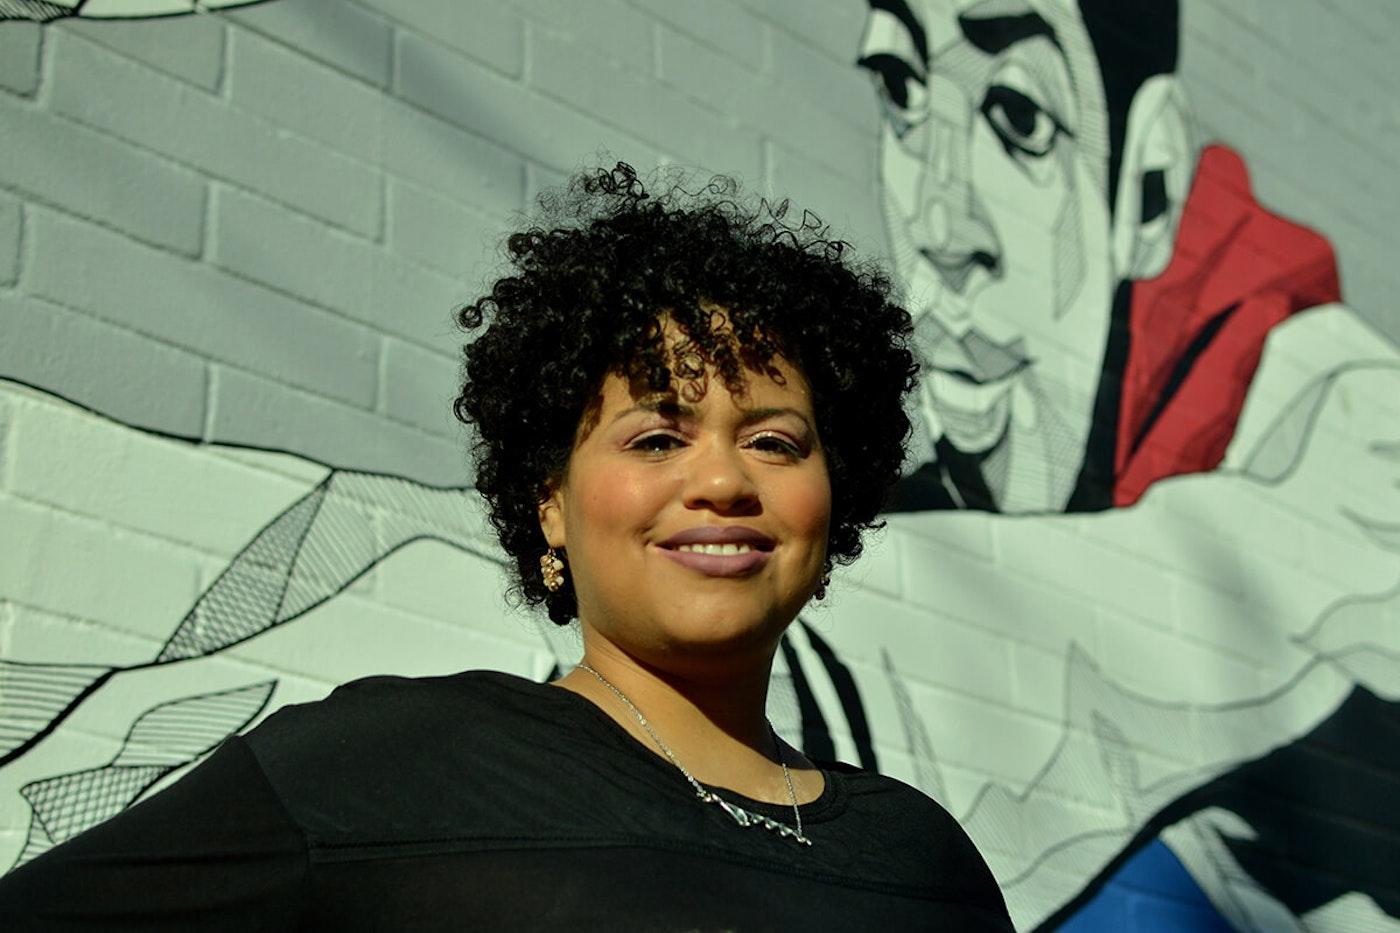 Denise Diaz - Floricua- Jobs for Justice